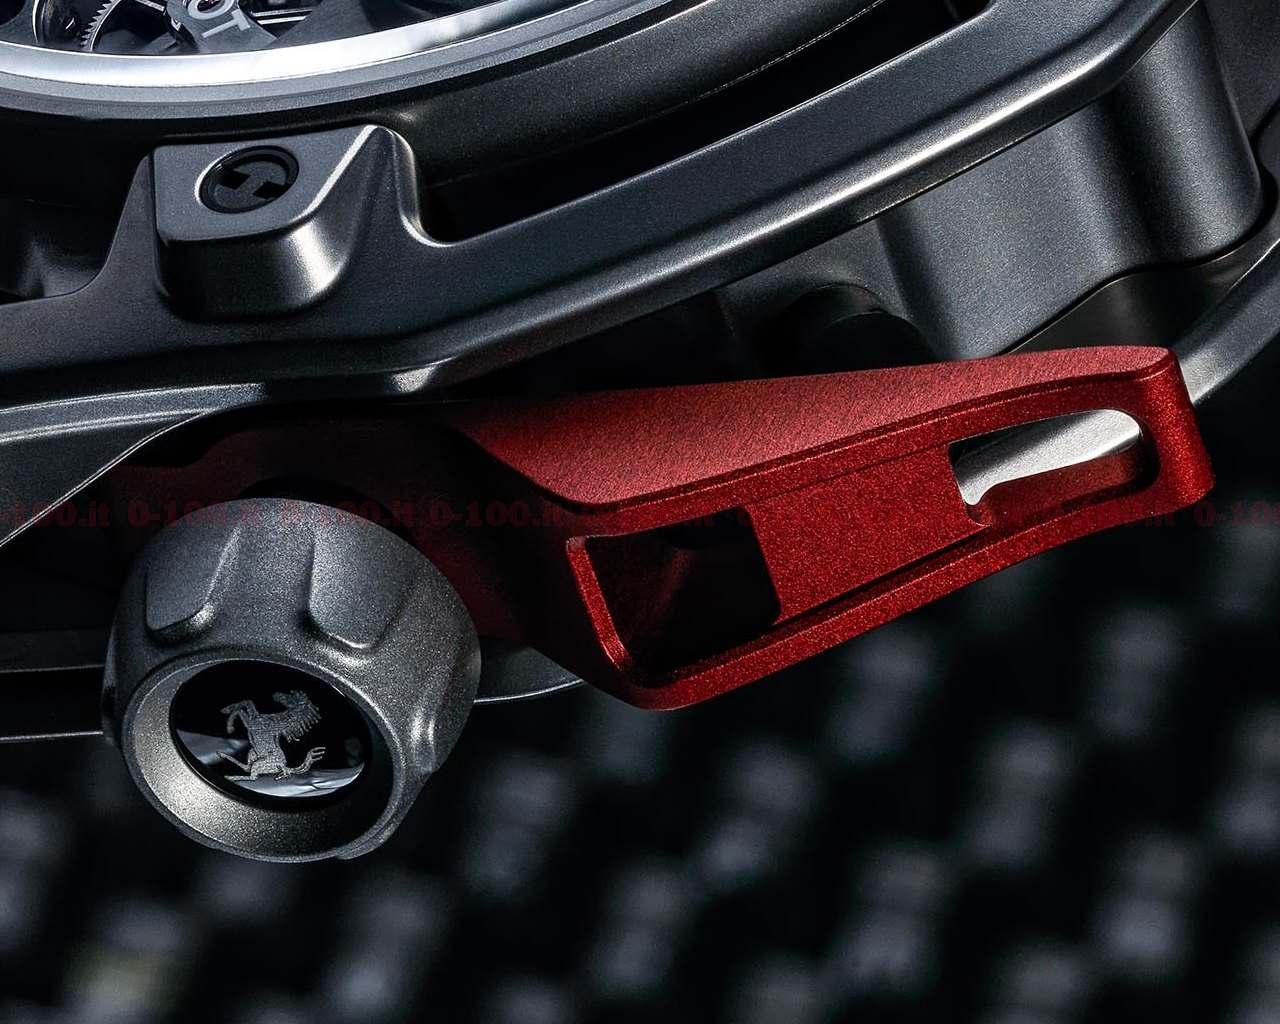 Hublot Techframe Ferrari 70 Years Tourbillon Chronograph Limited Edition_prezzo_price_0-10019